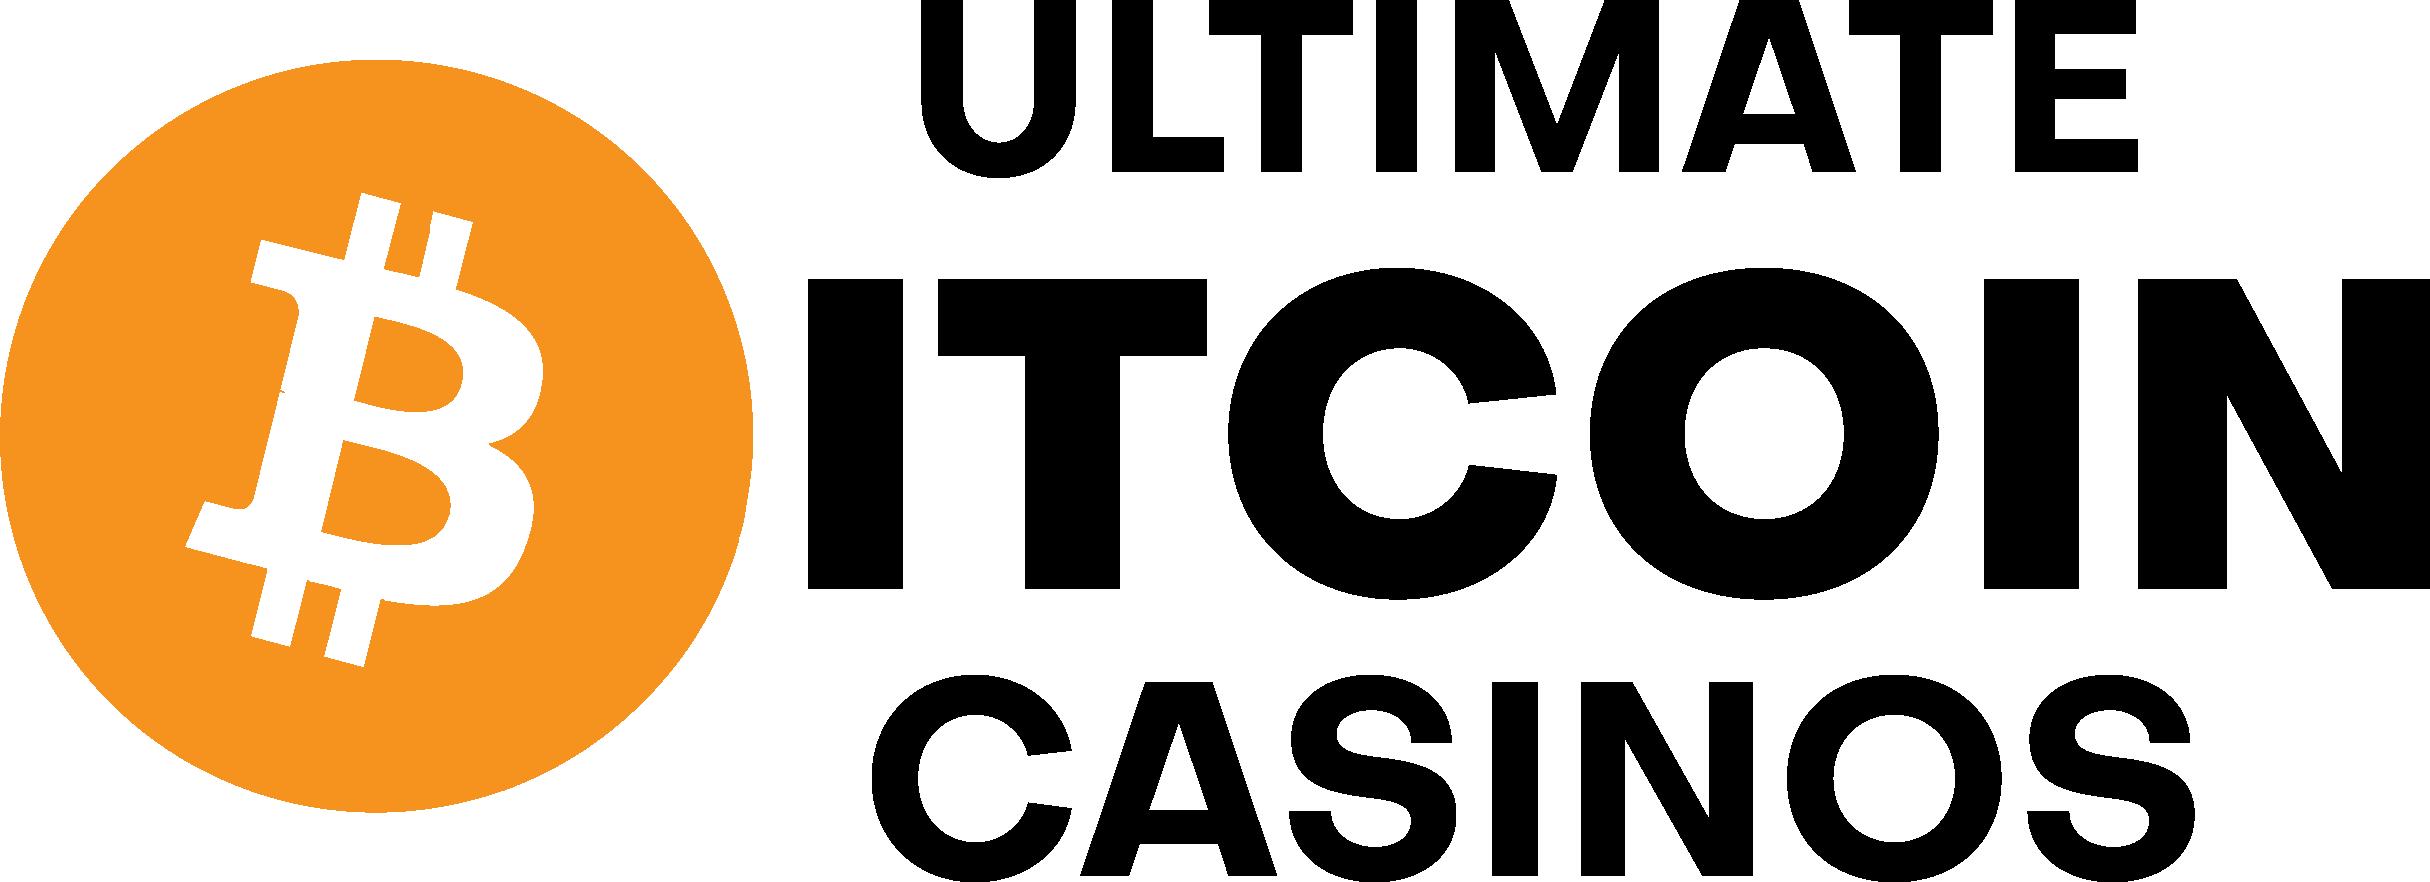 Ultimate Bitcoin casino logo